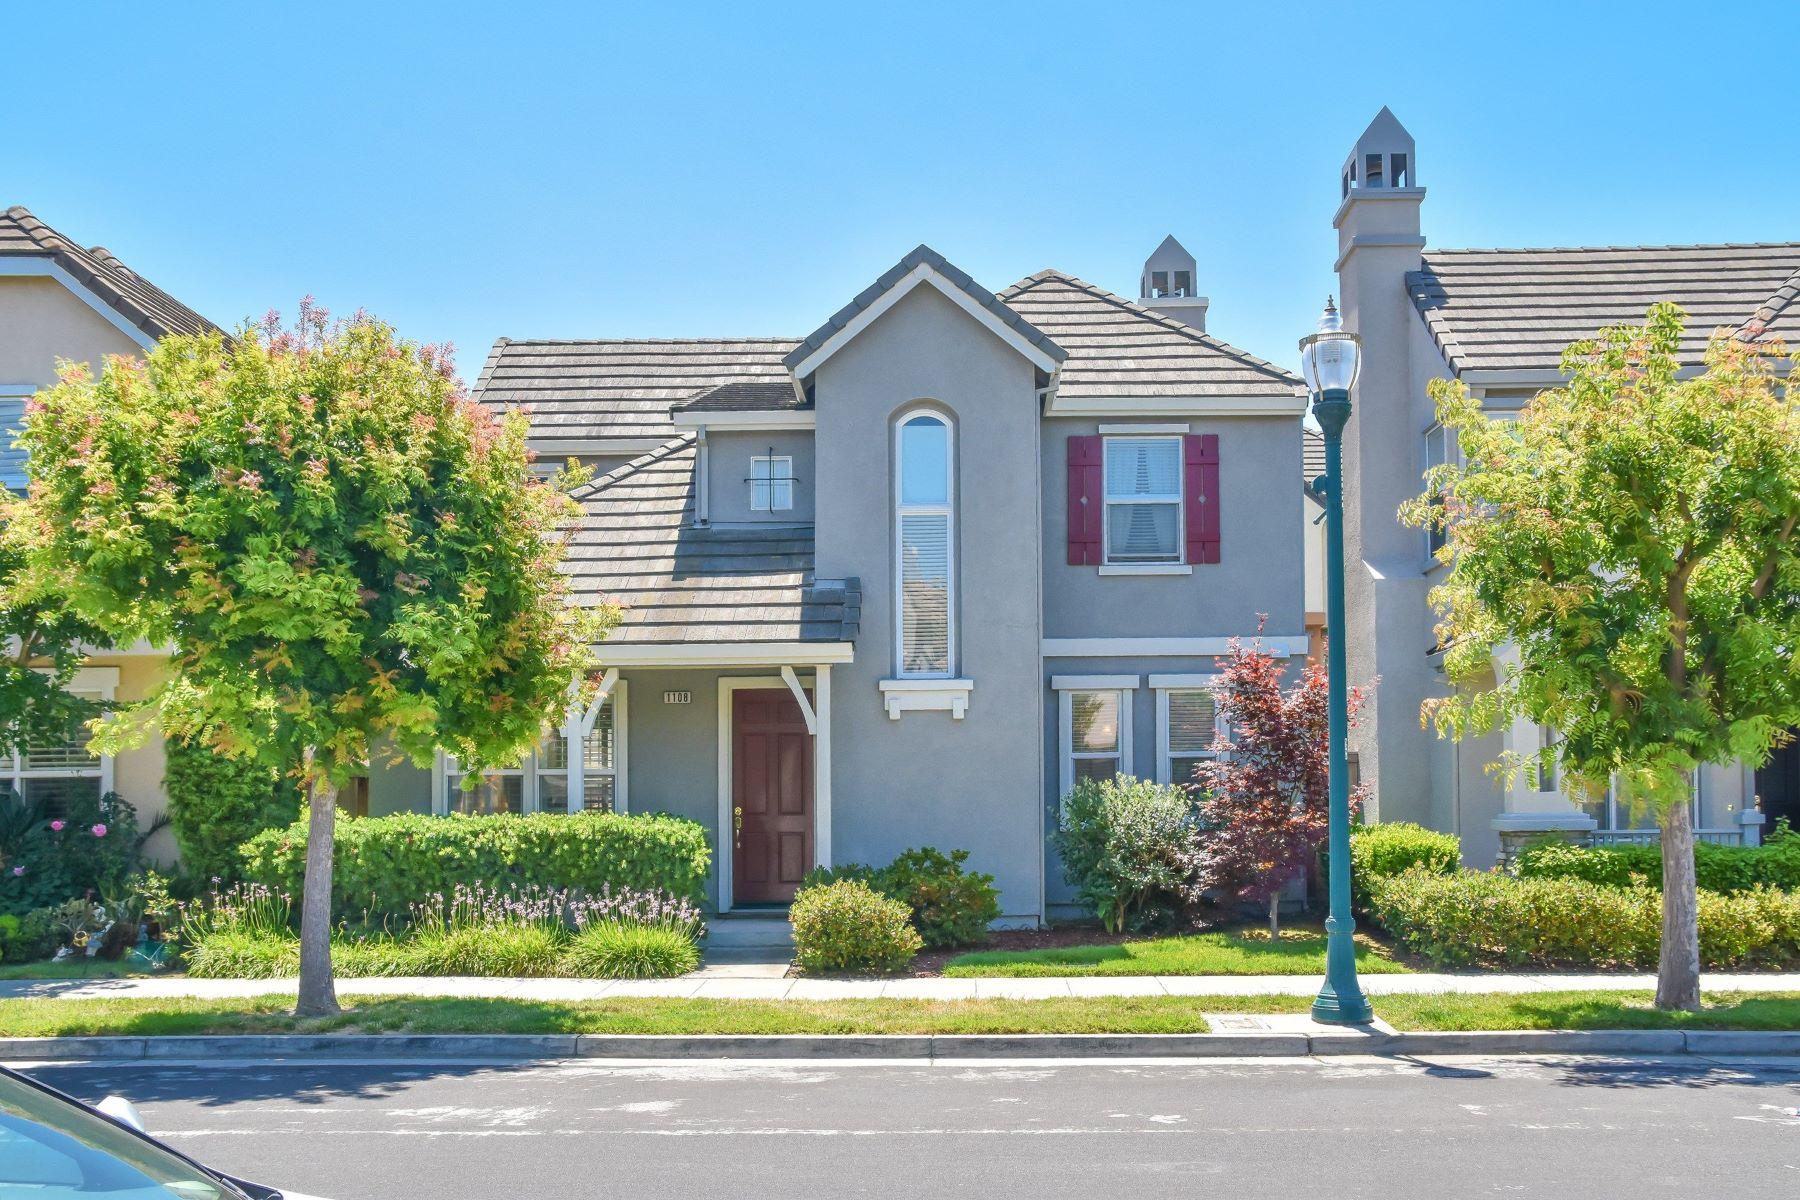 Single Family Homes 为 销售 在 1108 Wayne Way, San Mateo, CA 94403 1108 Wayne Way 圣马特奥市, 加利福尼亚州 94403 美国